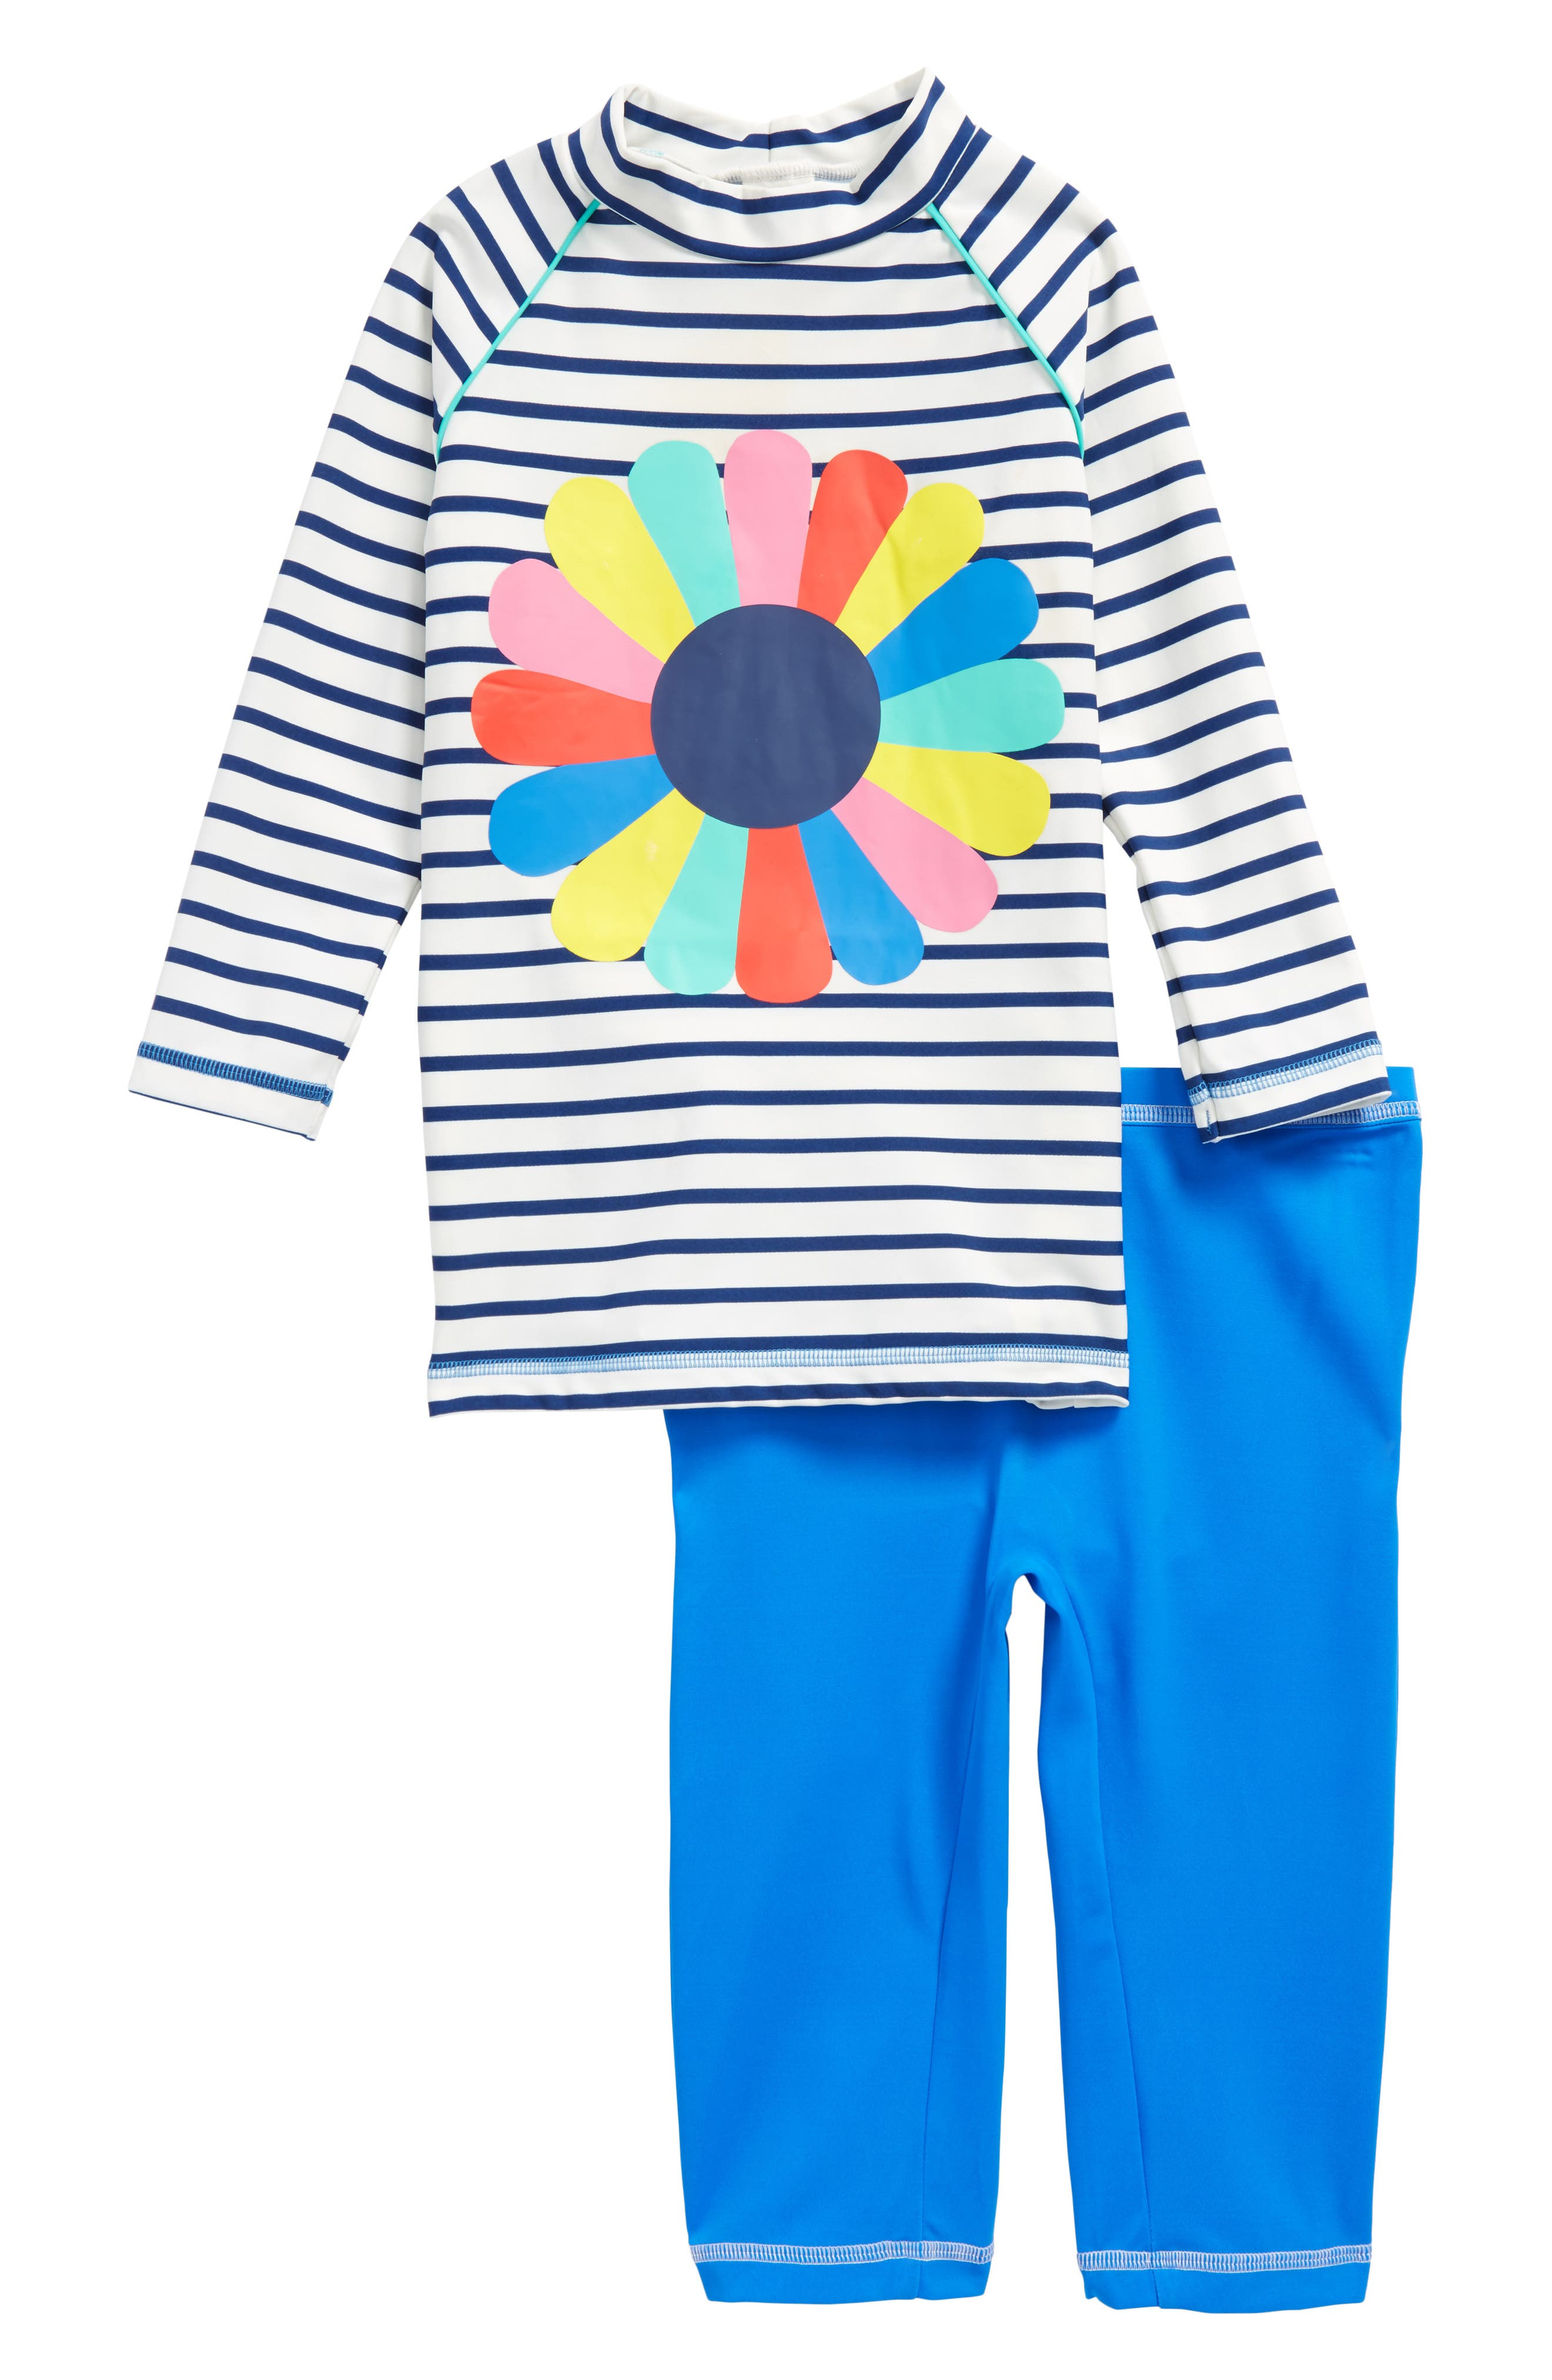 Sea Explorer Two-Piece Rashguard Swimsuit,                         Main,                         color, 404